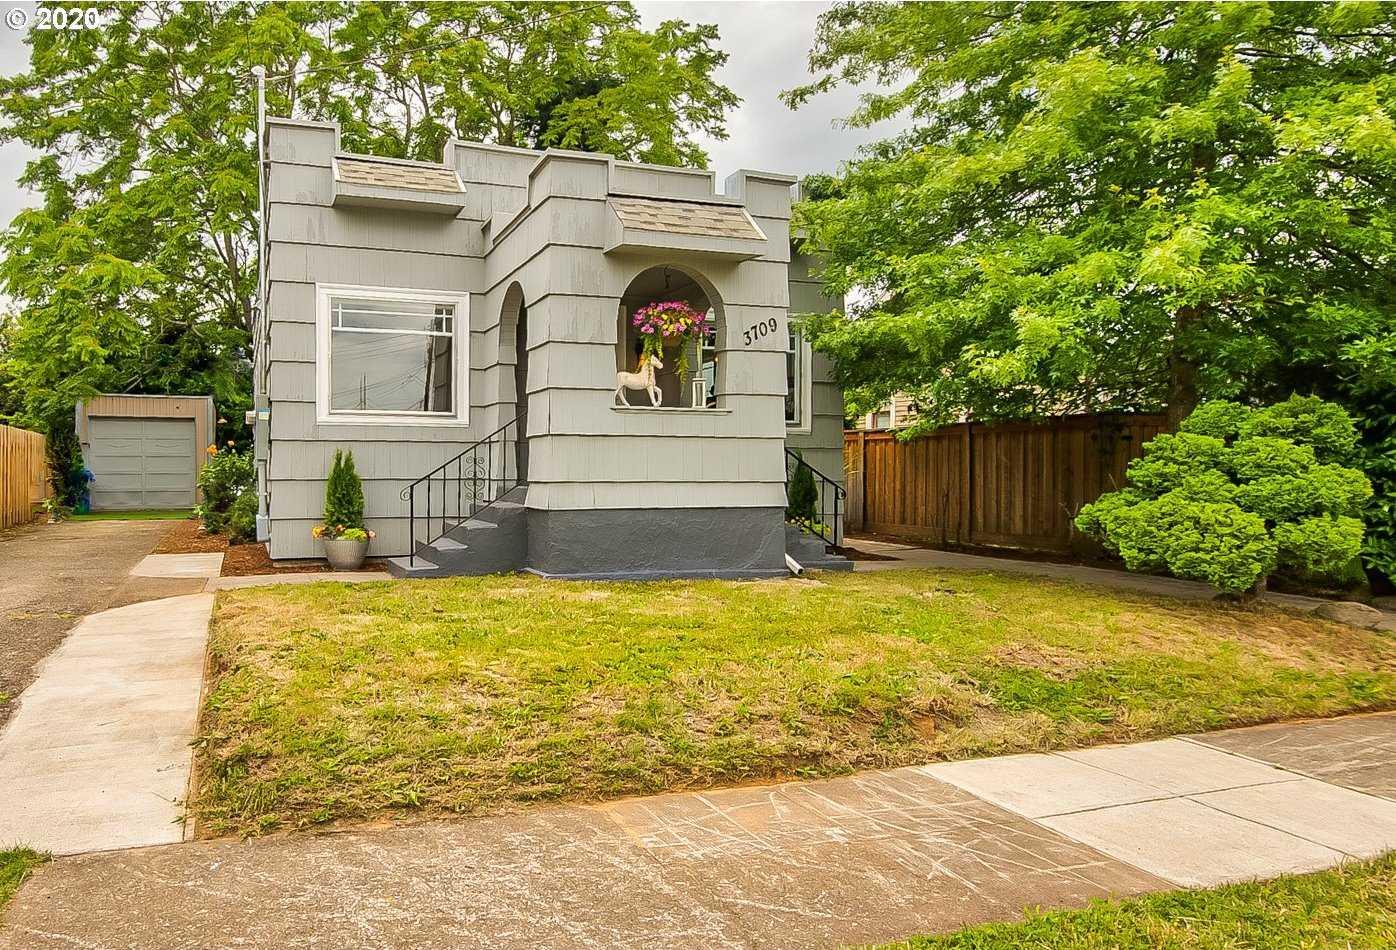 $449,000 - 3Br/2Ba - for Sale in Foster-powell, Portland